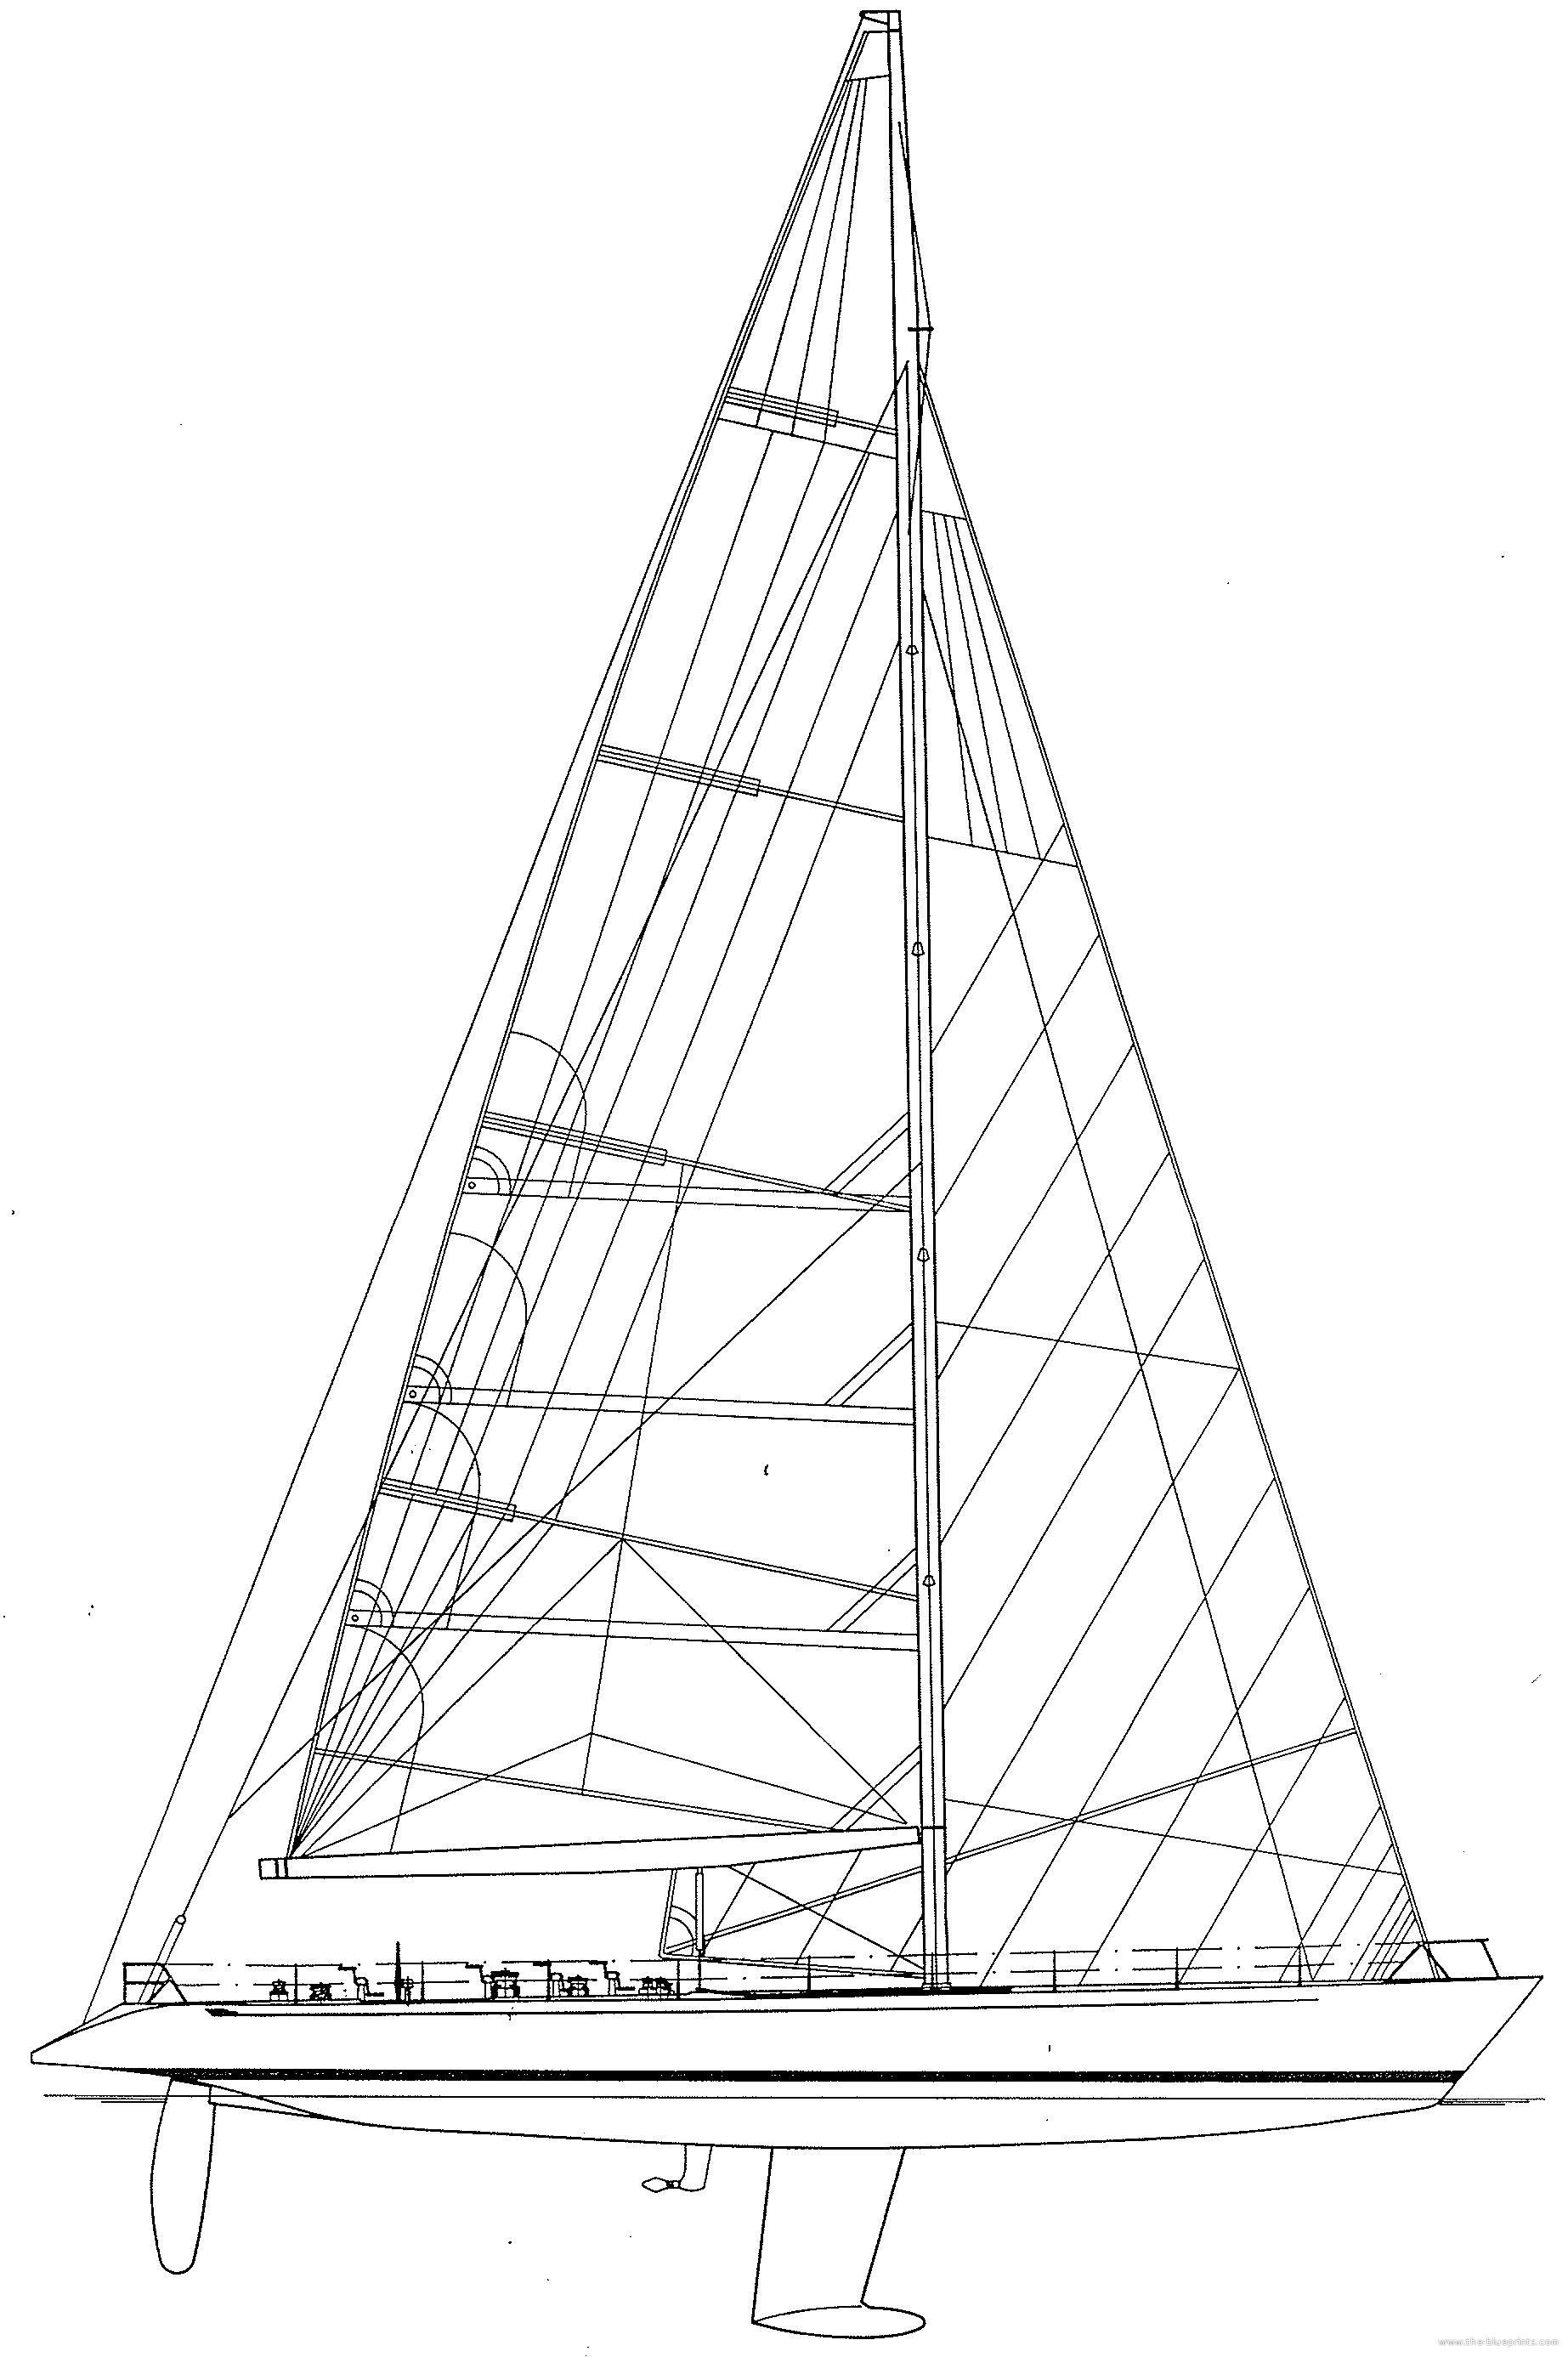 Blueprints ships sail boats baltic 81 maxi sail baltic 81 maxi sail malvernweather Image collections